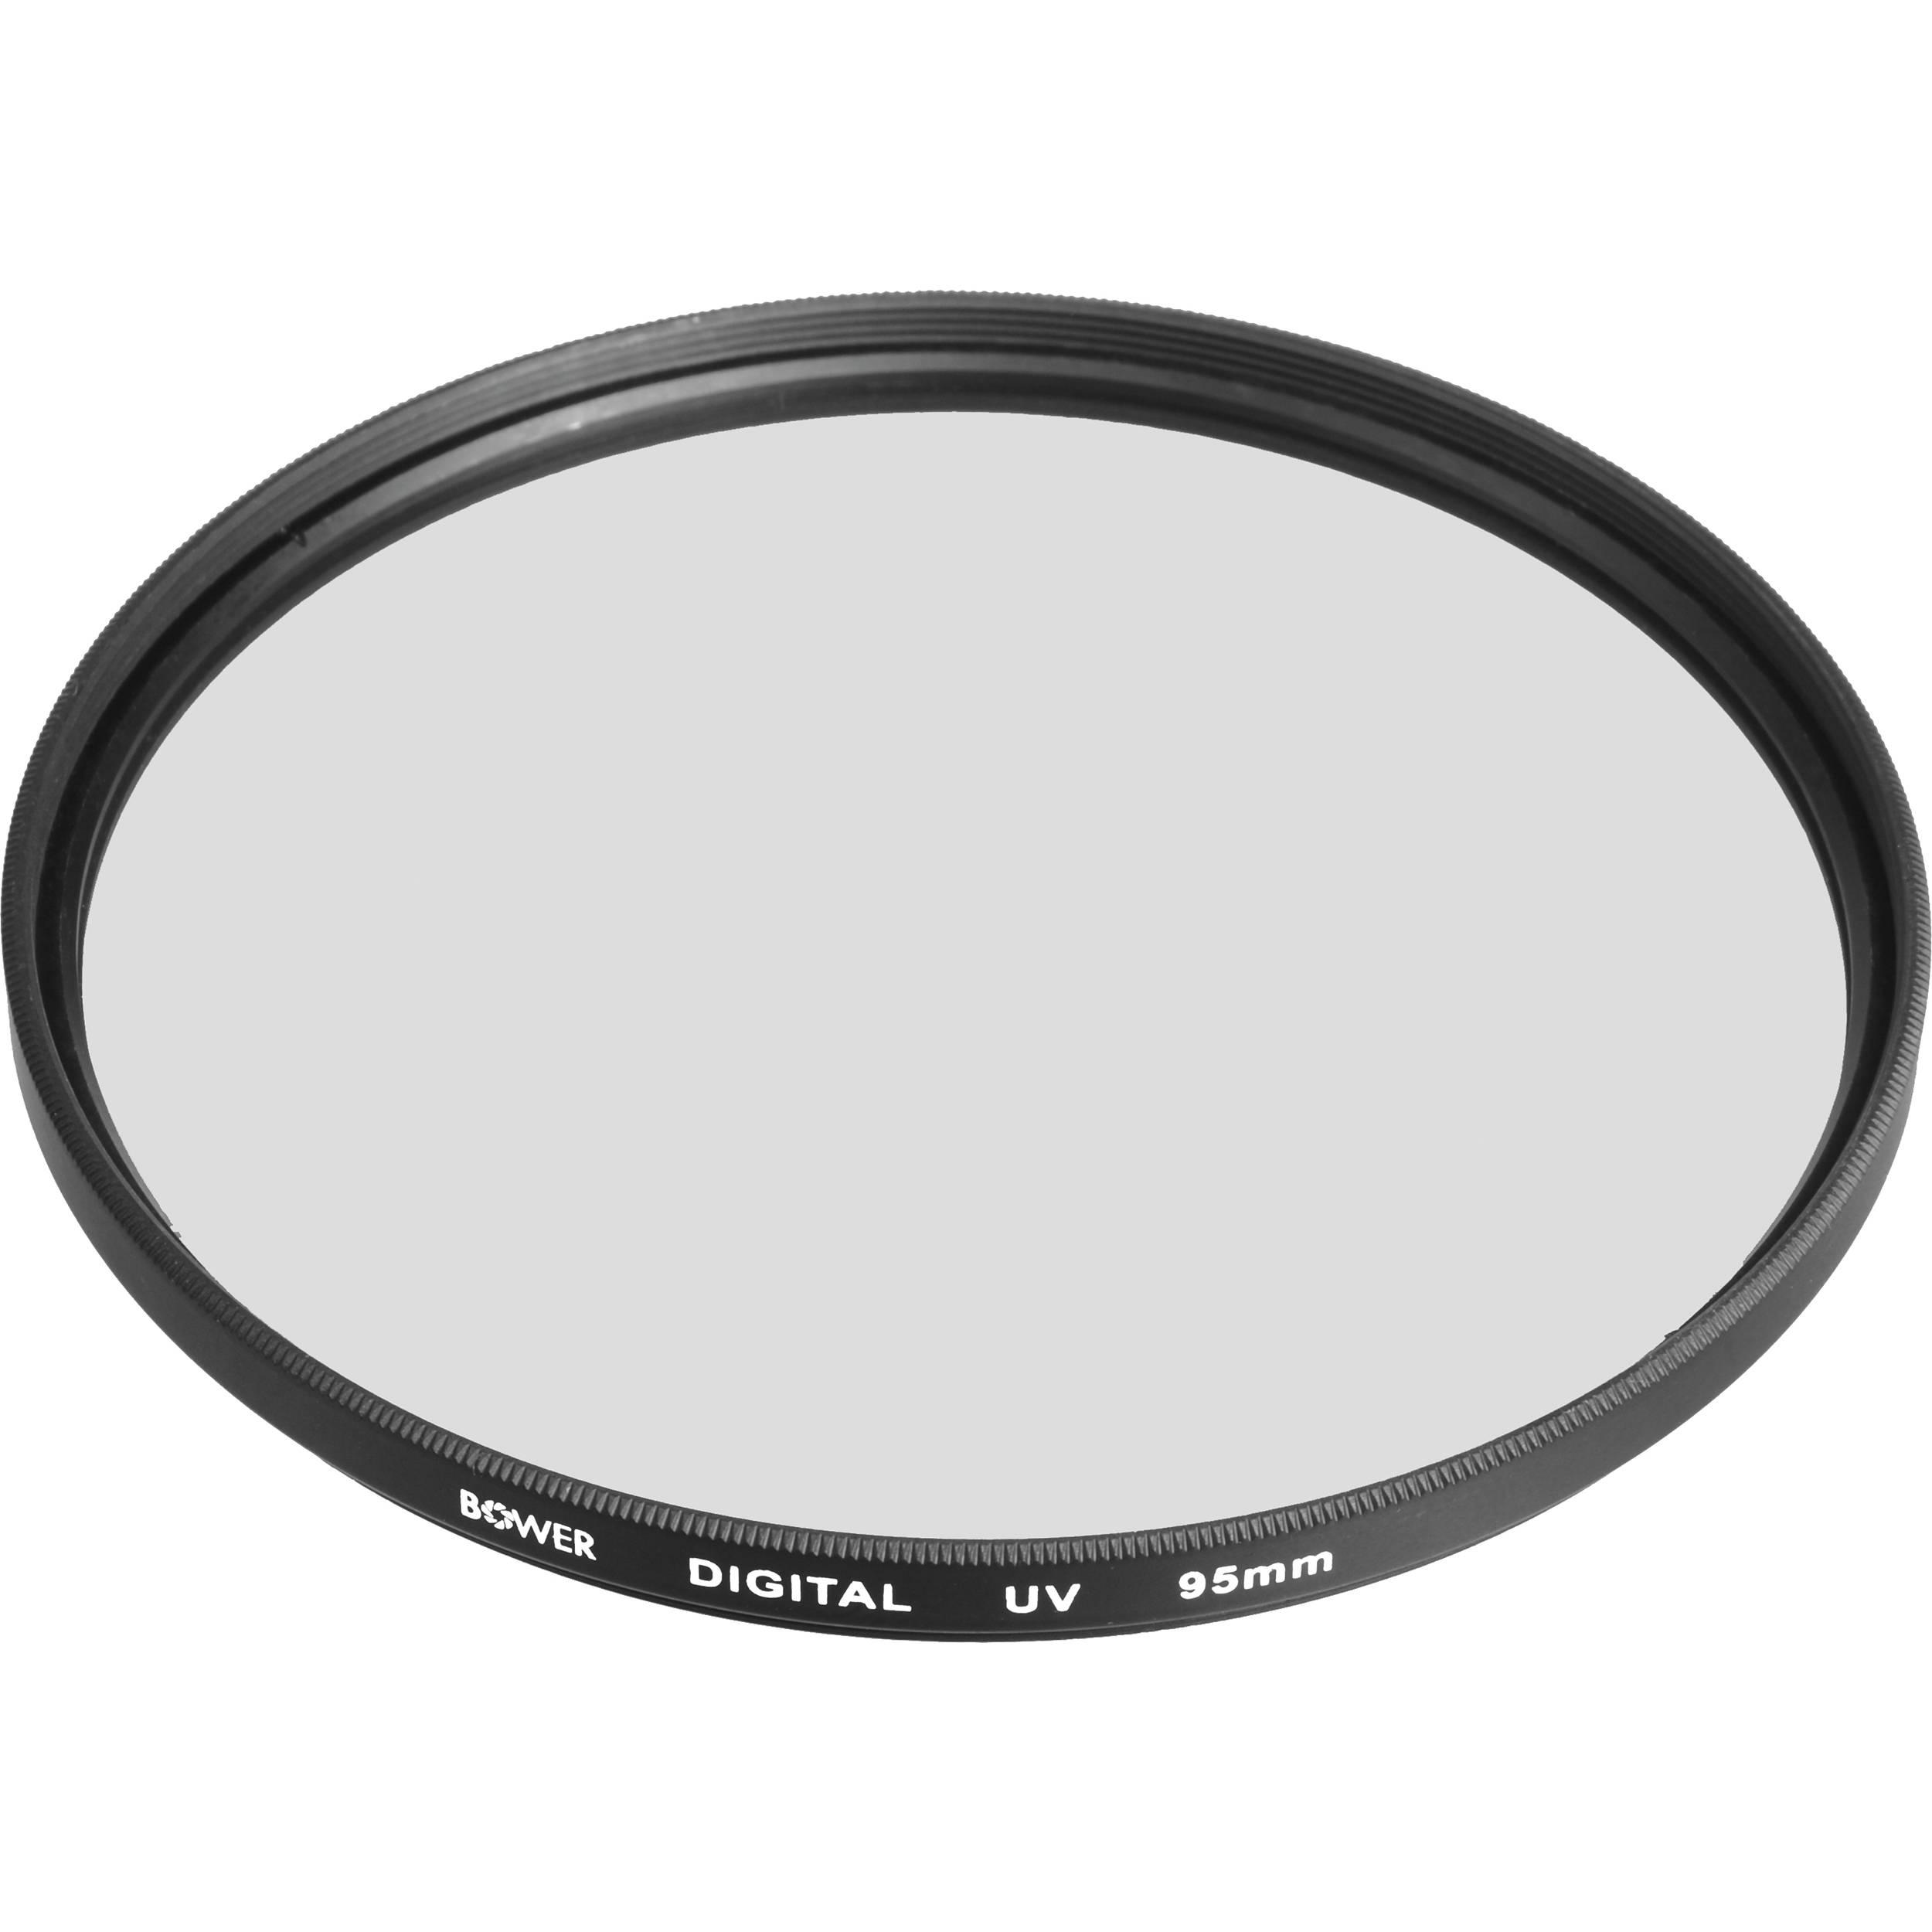 bower 95mm digital hd uv filter fuc95 b h photo video. Black Bedroom Furniture Sets. Home Design Ideas